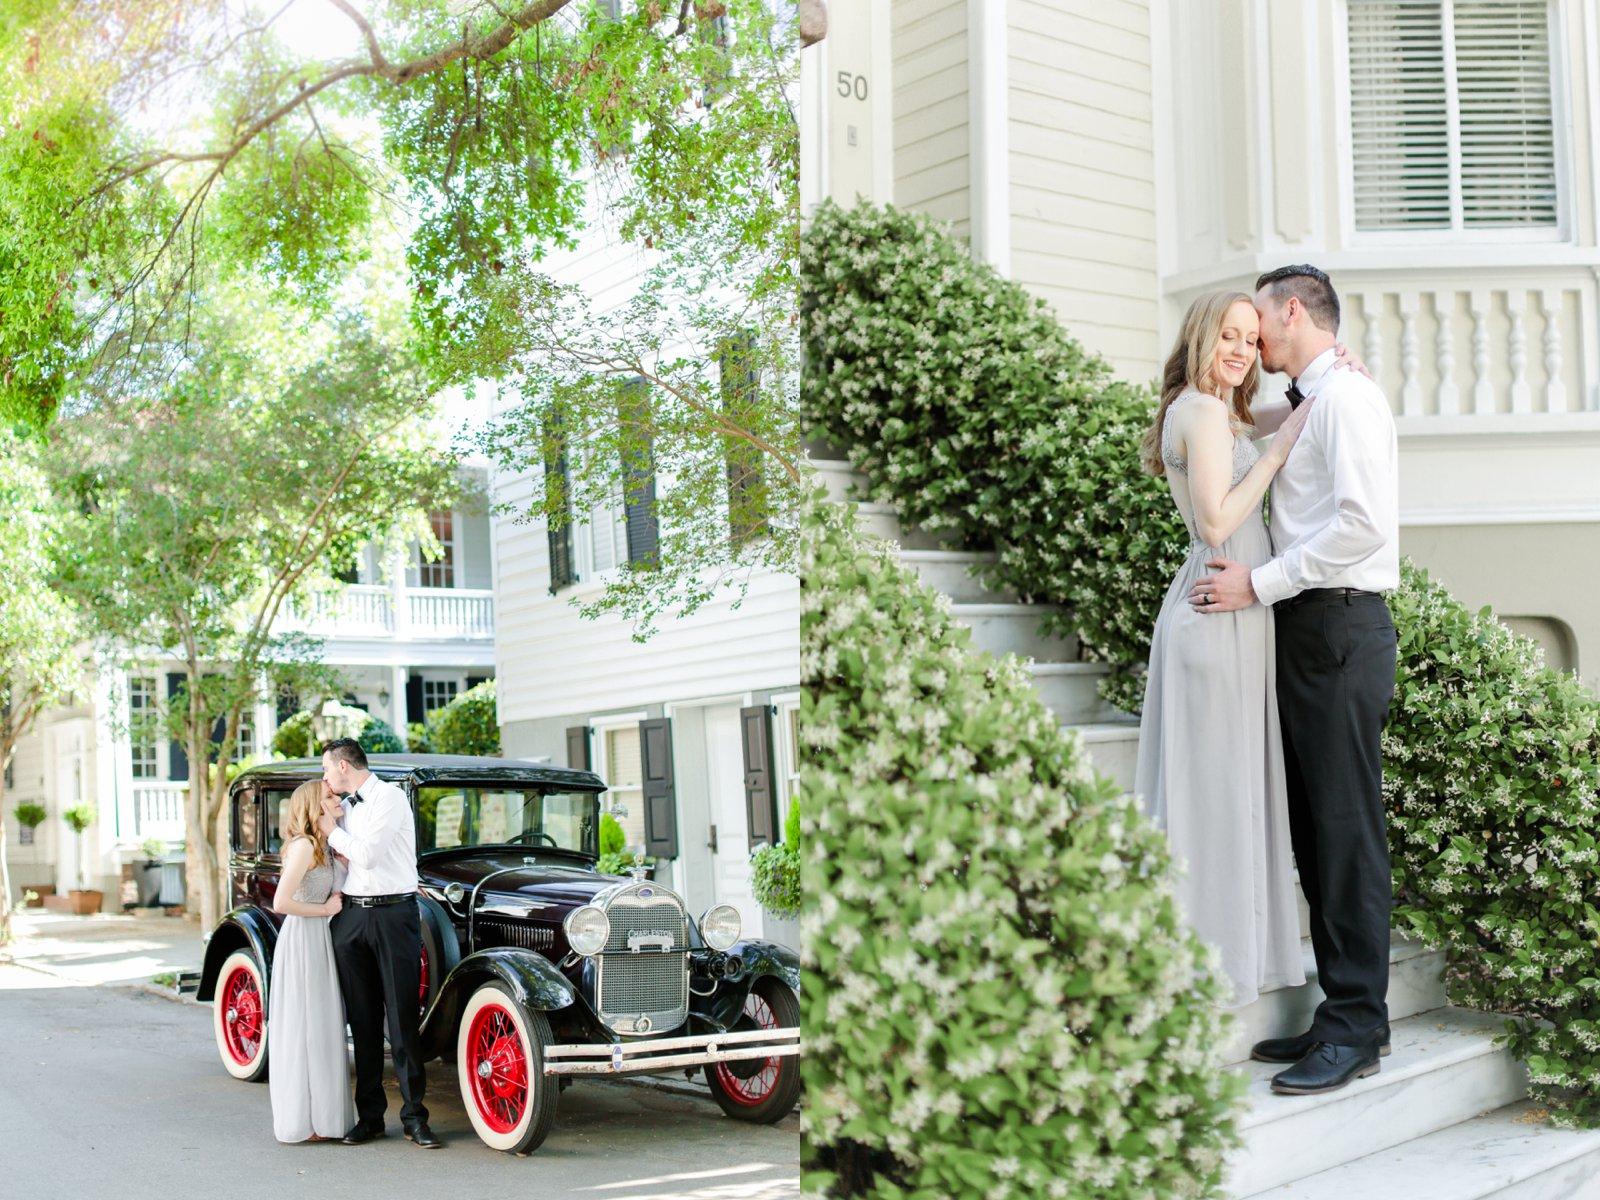 wedding_photographer_Missouri_Destination_elope_intimate_Saint_James_MO_Missouri_KansasCity_Jeff_City_Jefferson_Columbia_Engagement_Photos_Pictures_Session_Best_Videographer_0298.jpg